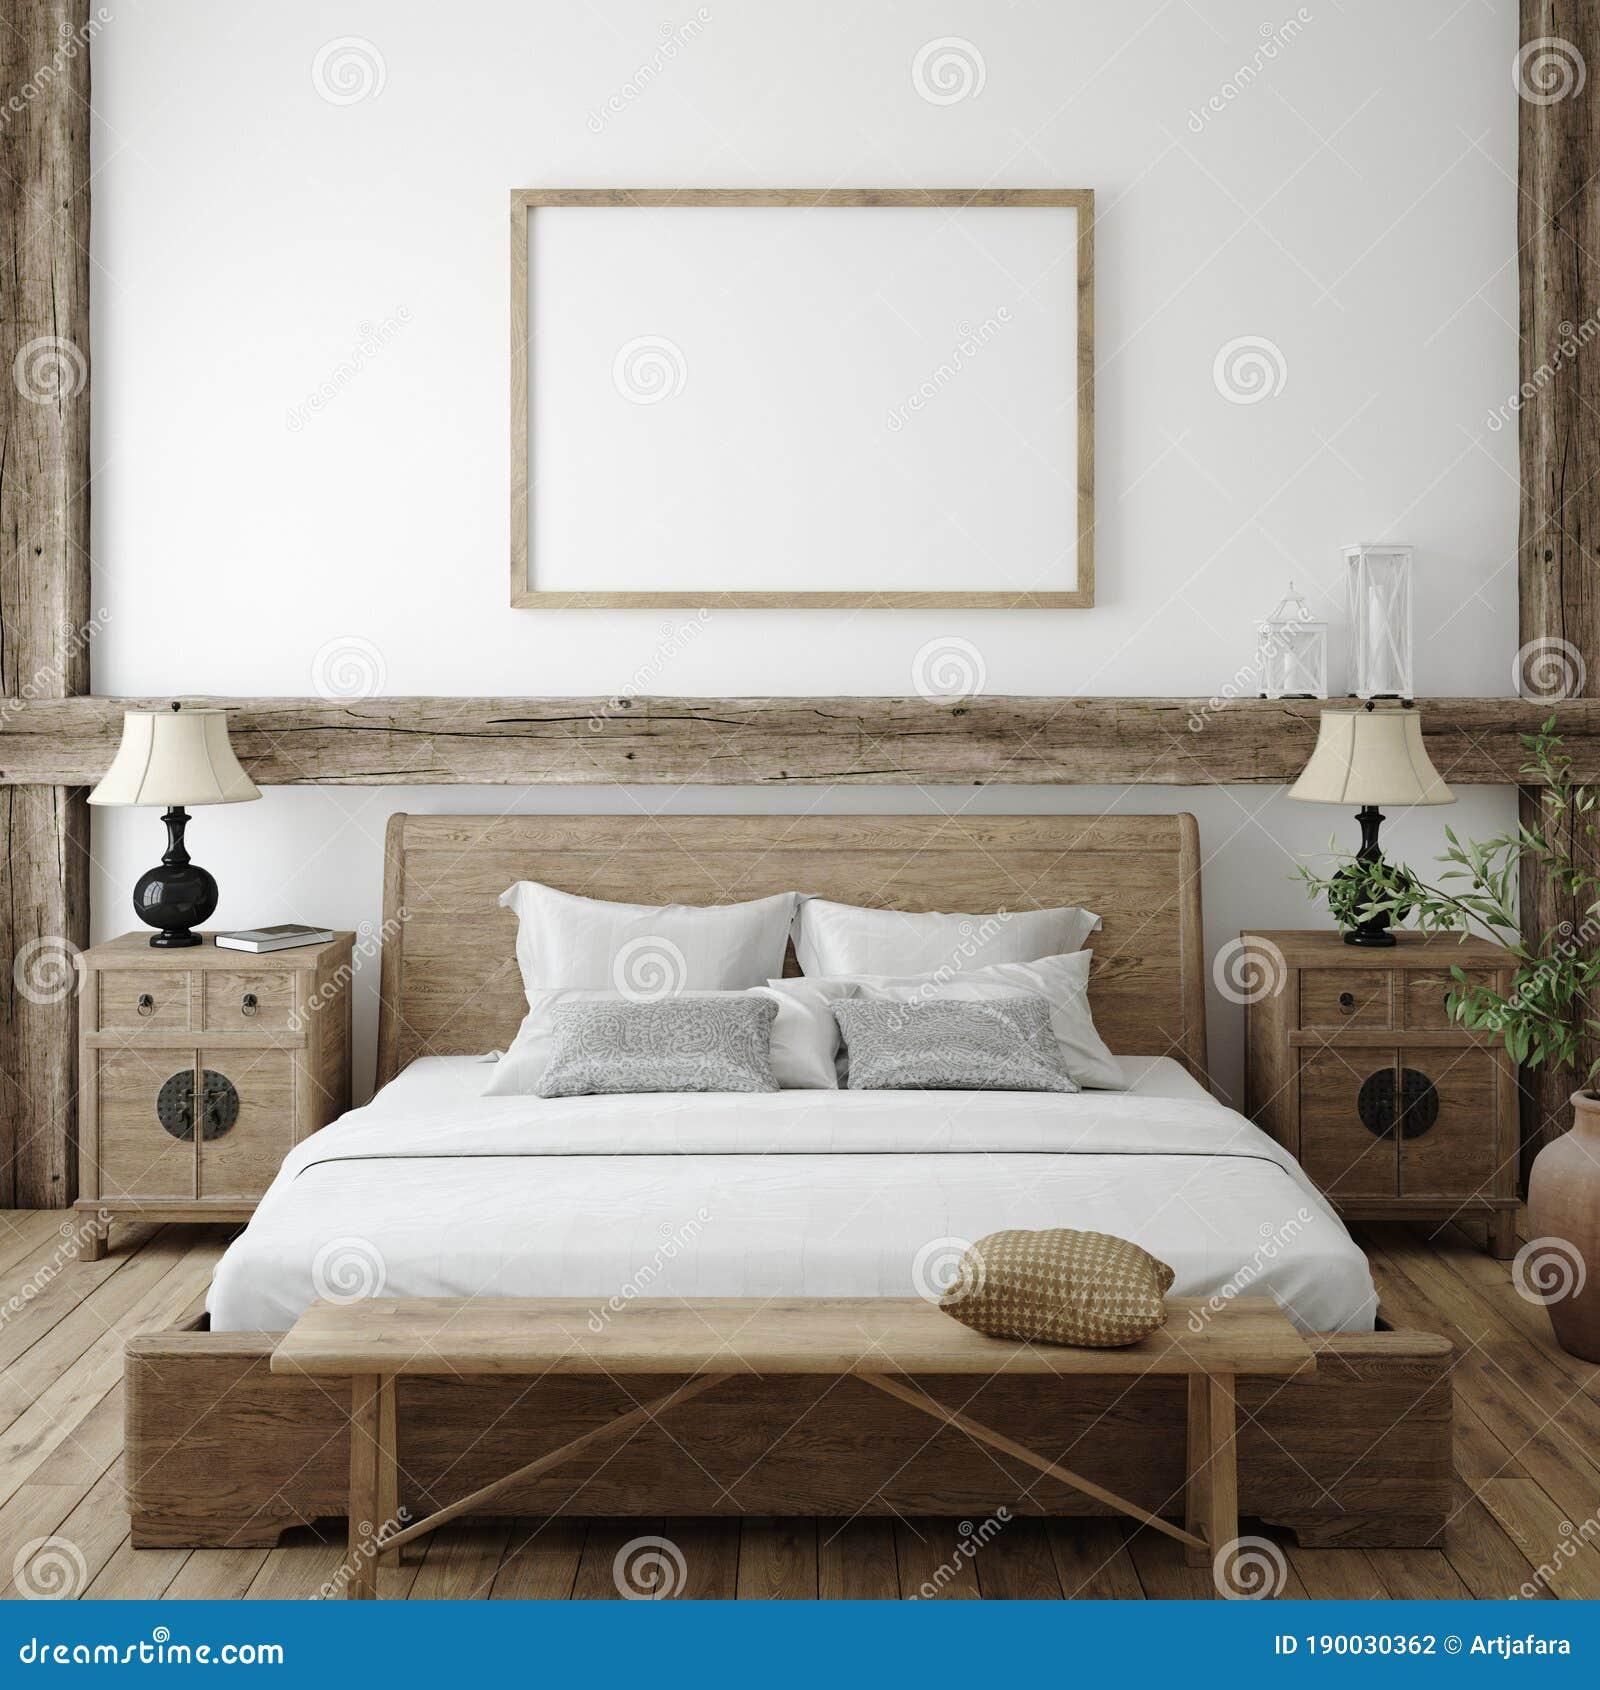 Mockup Frame In Bedroom Interior Background Farmhouse Style Stock Illustration Illustration Of Background Natural 190030362